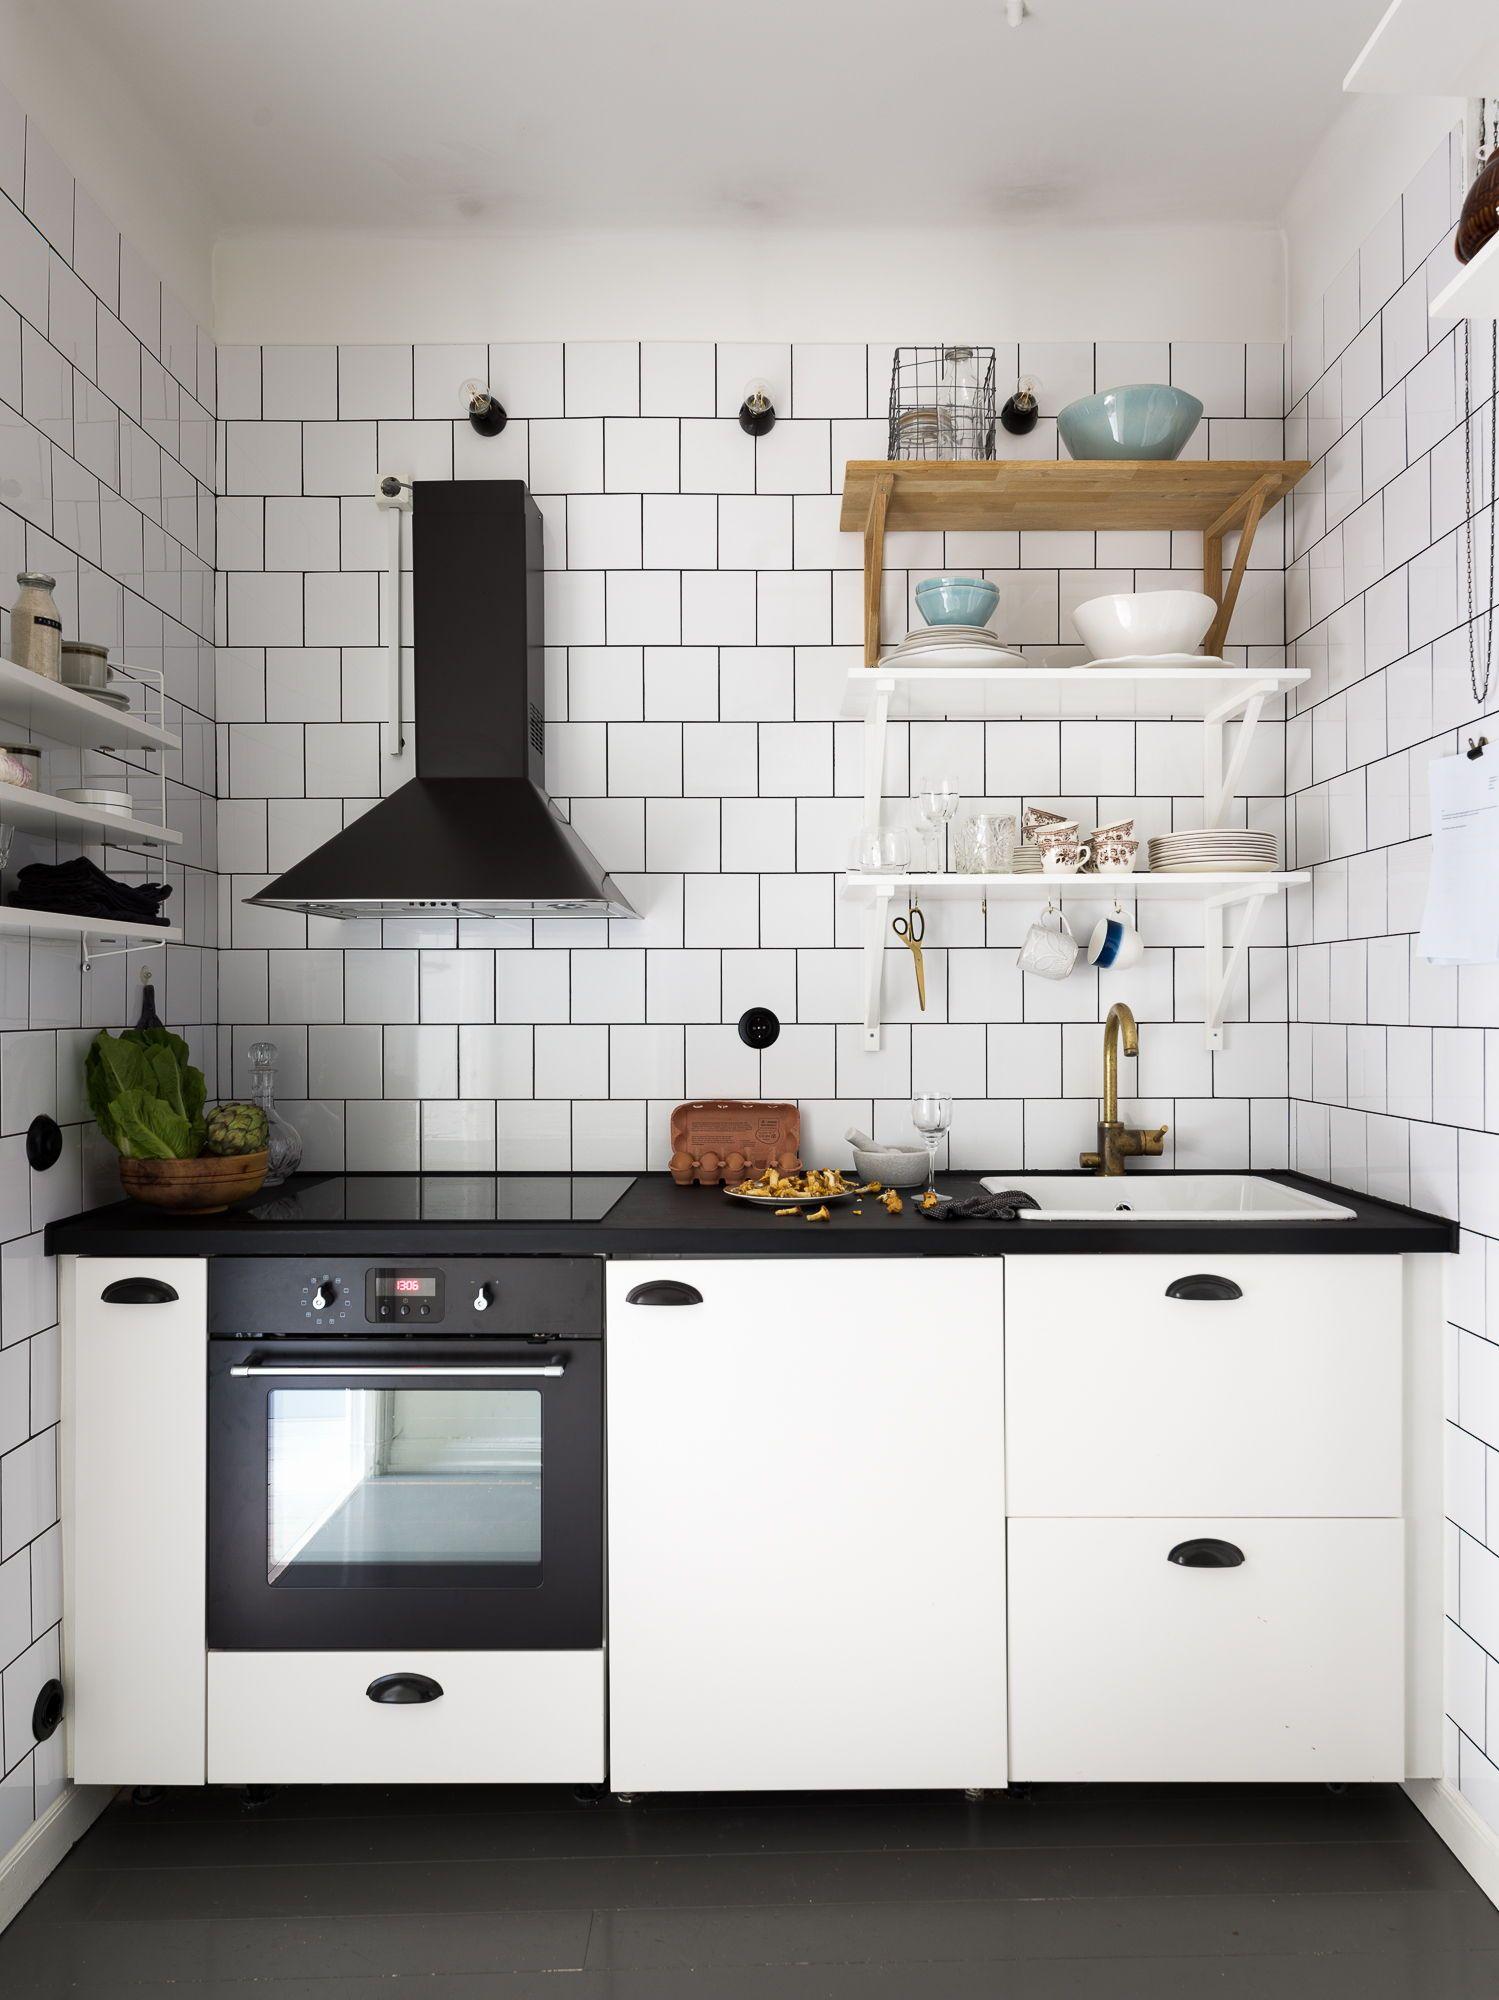 Small Kitchen In Black And White Kitchen Remodel Small White